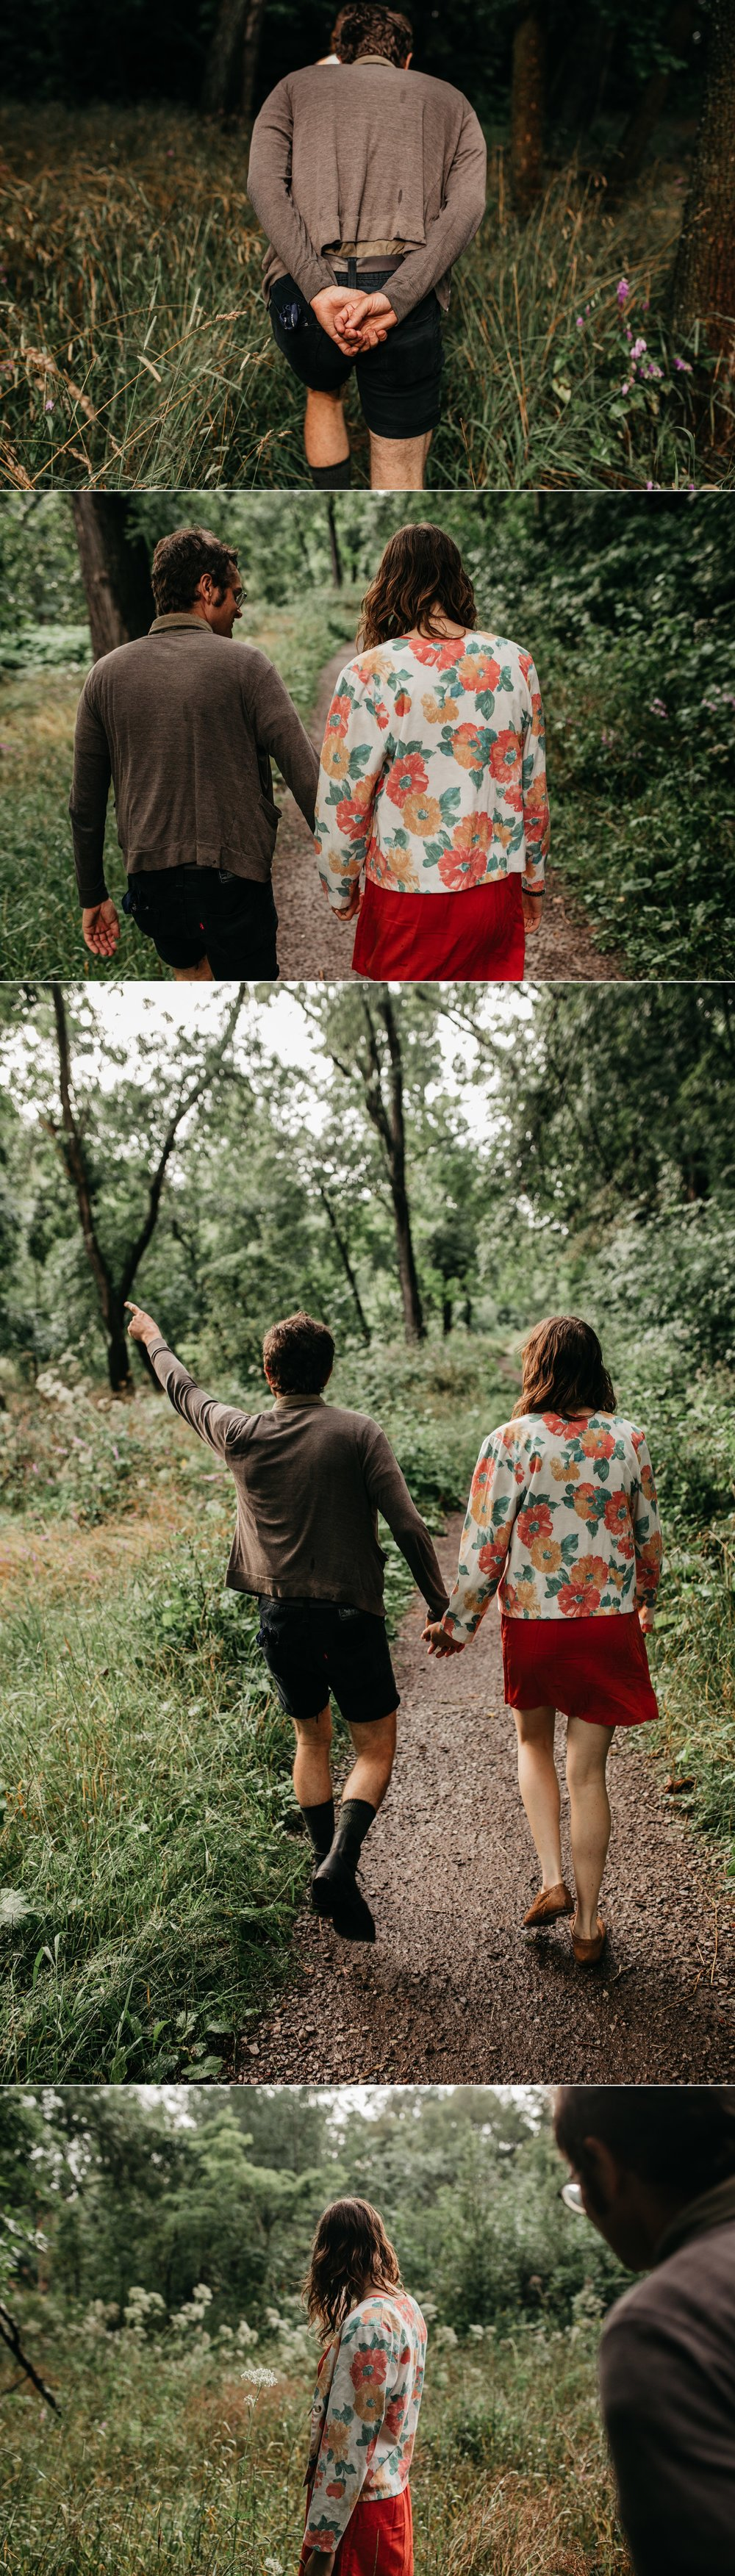 mandy aaron engagement minneapolis minnesota texas austin wedding elopement destination intimate best photographer_0116.jpg